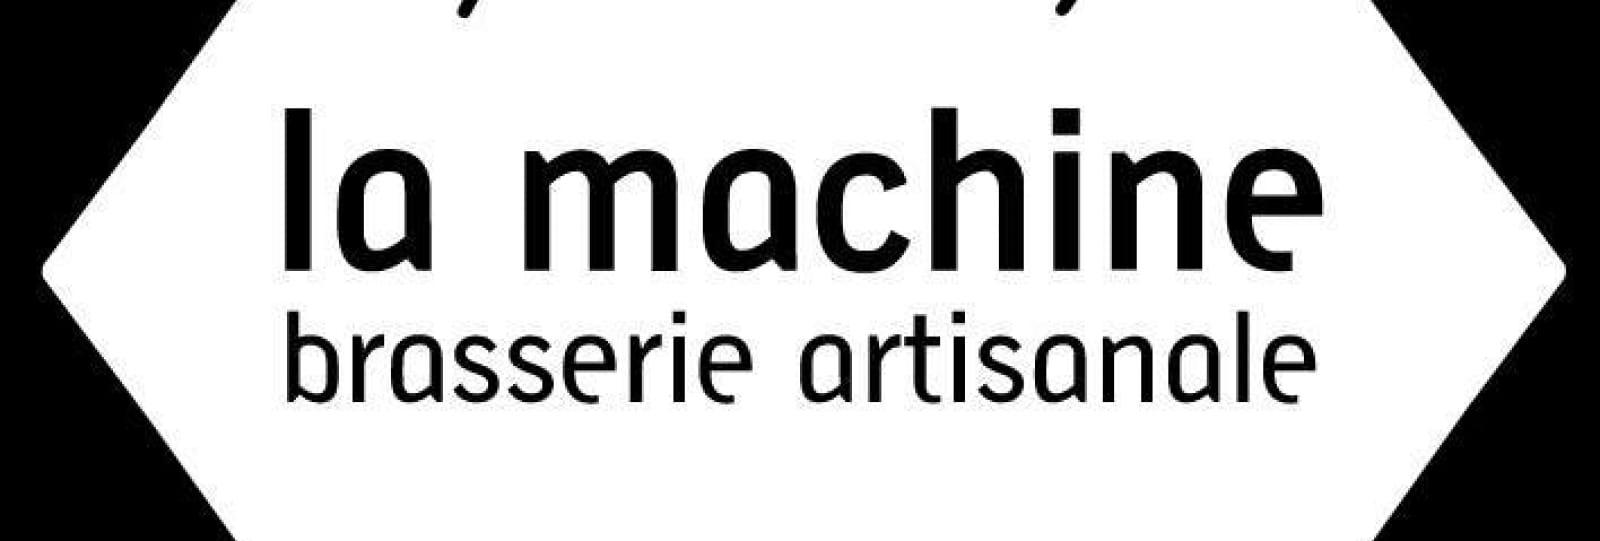 La Machine - brasserie artisanale